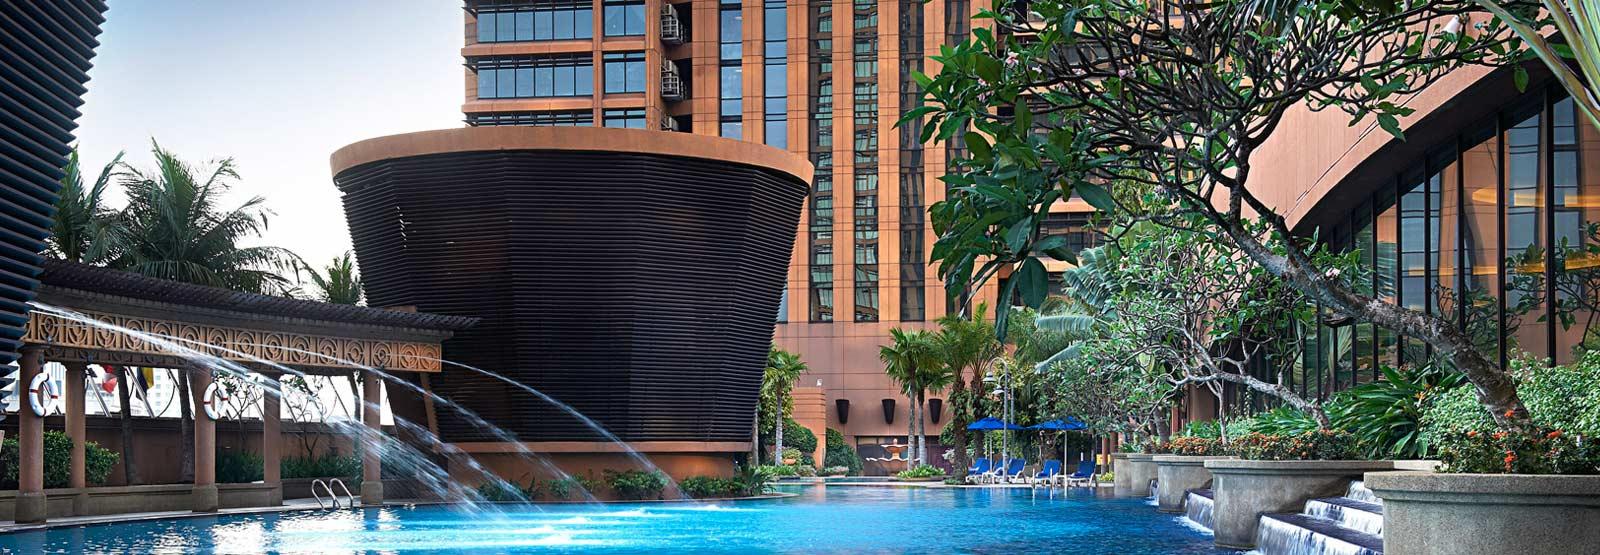 Hotel In Kuala Lumpur Berjaya Times Square Hotel